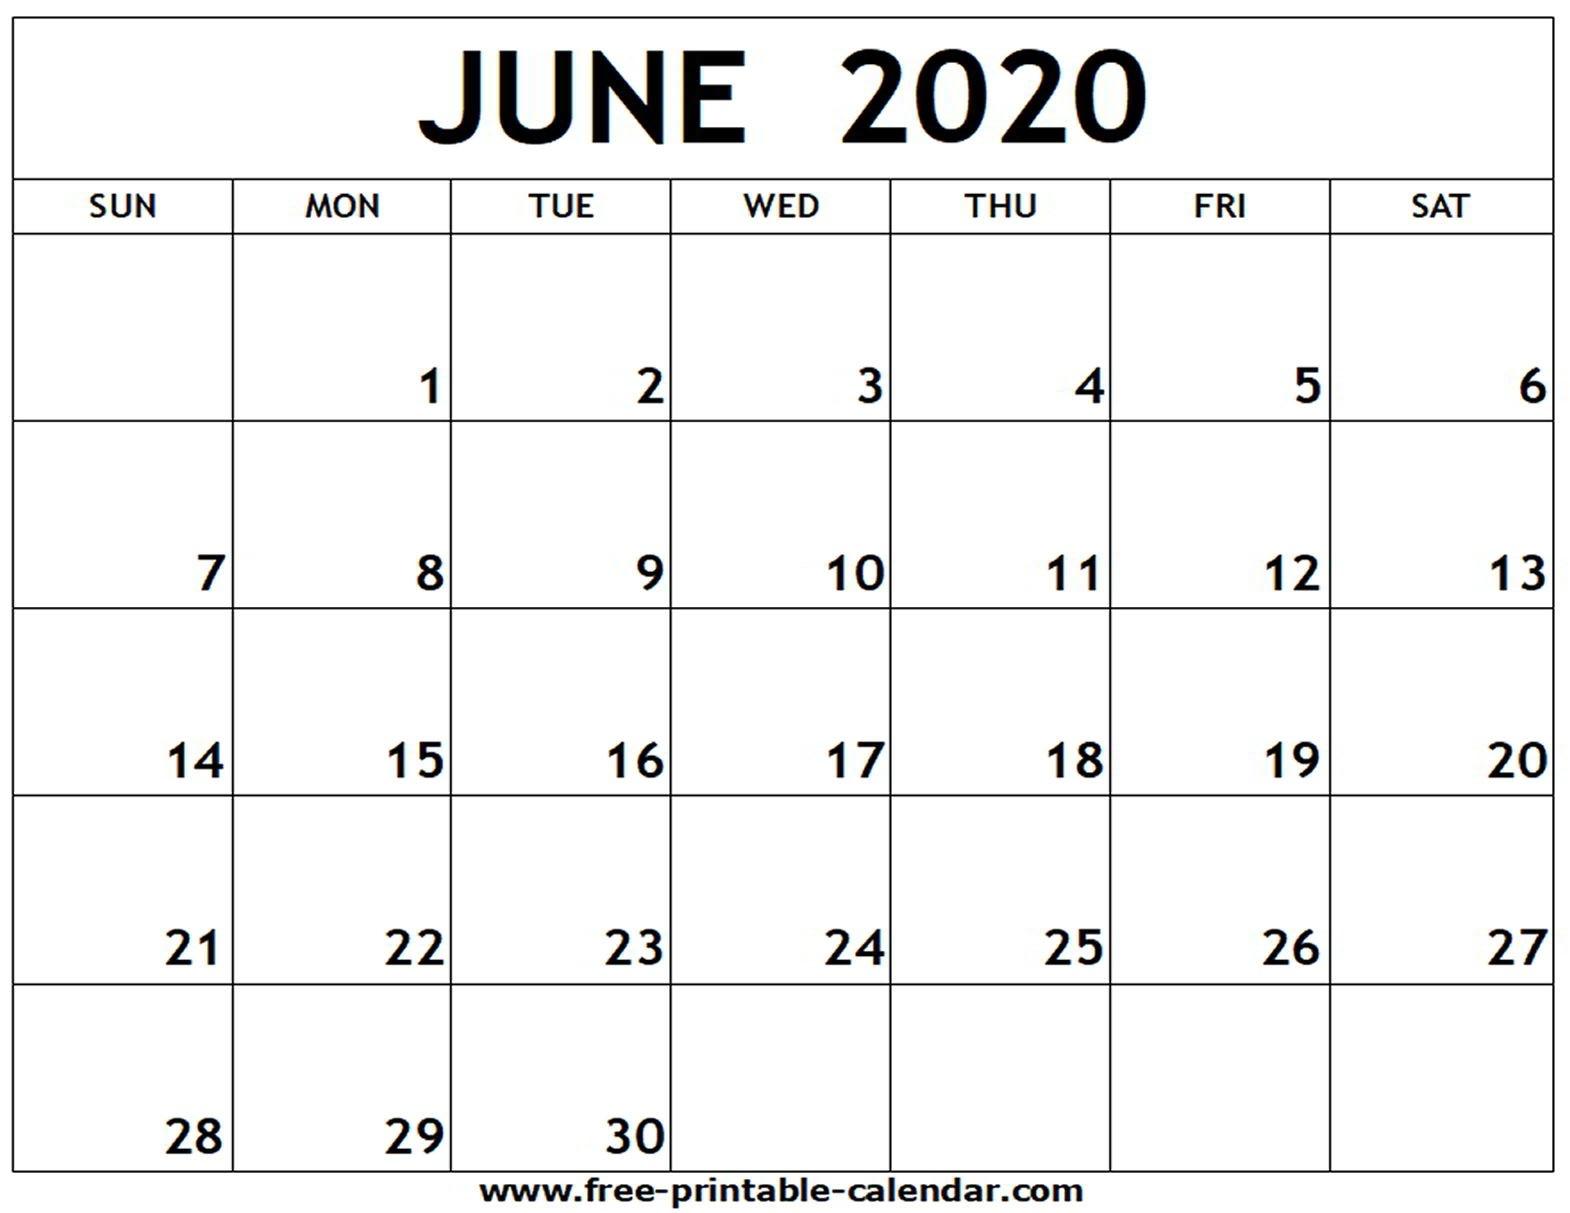 June 2020 Printable Calendar - Free-Printable-Calendar-Blank Calendar 2020 June July August